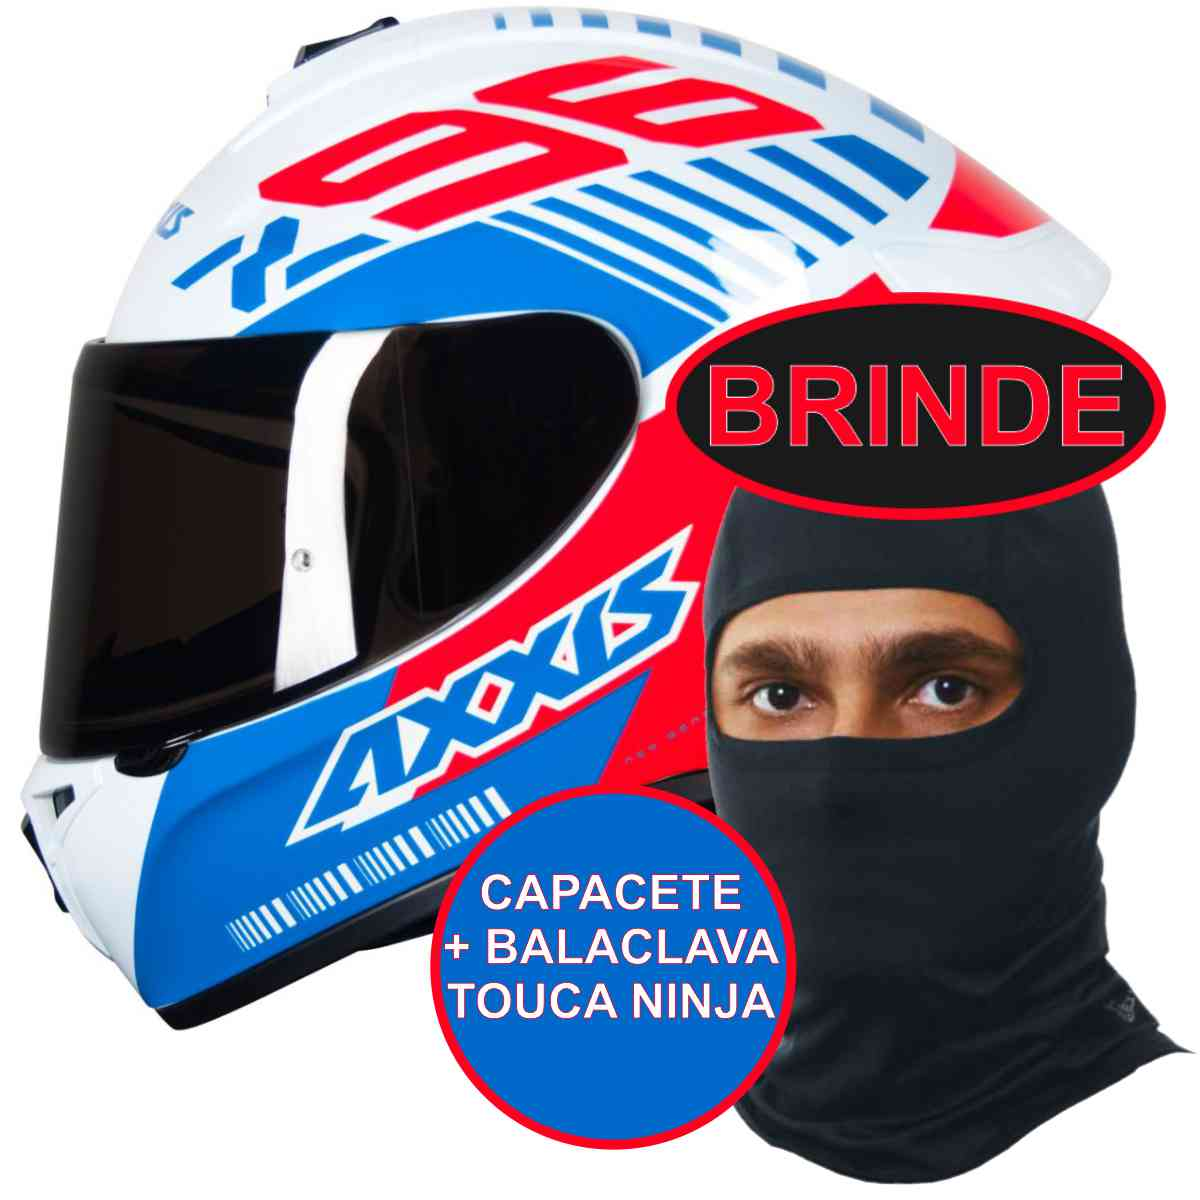 CAPACETE MOTO AXXIS DRAKEN Z96 BRANCO VERMELHO E AZUL BRILHANTE Nº 62 + BALACLAVA TOUCA NINJA